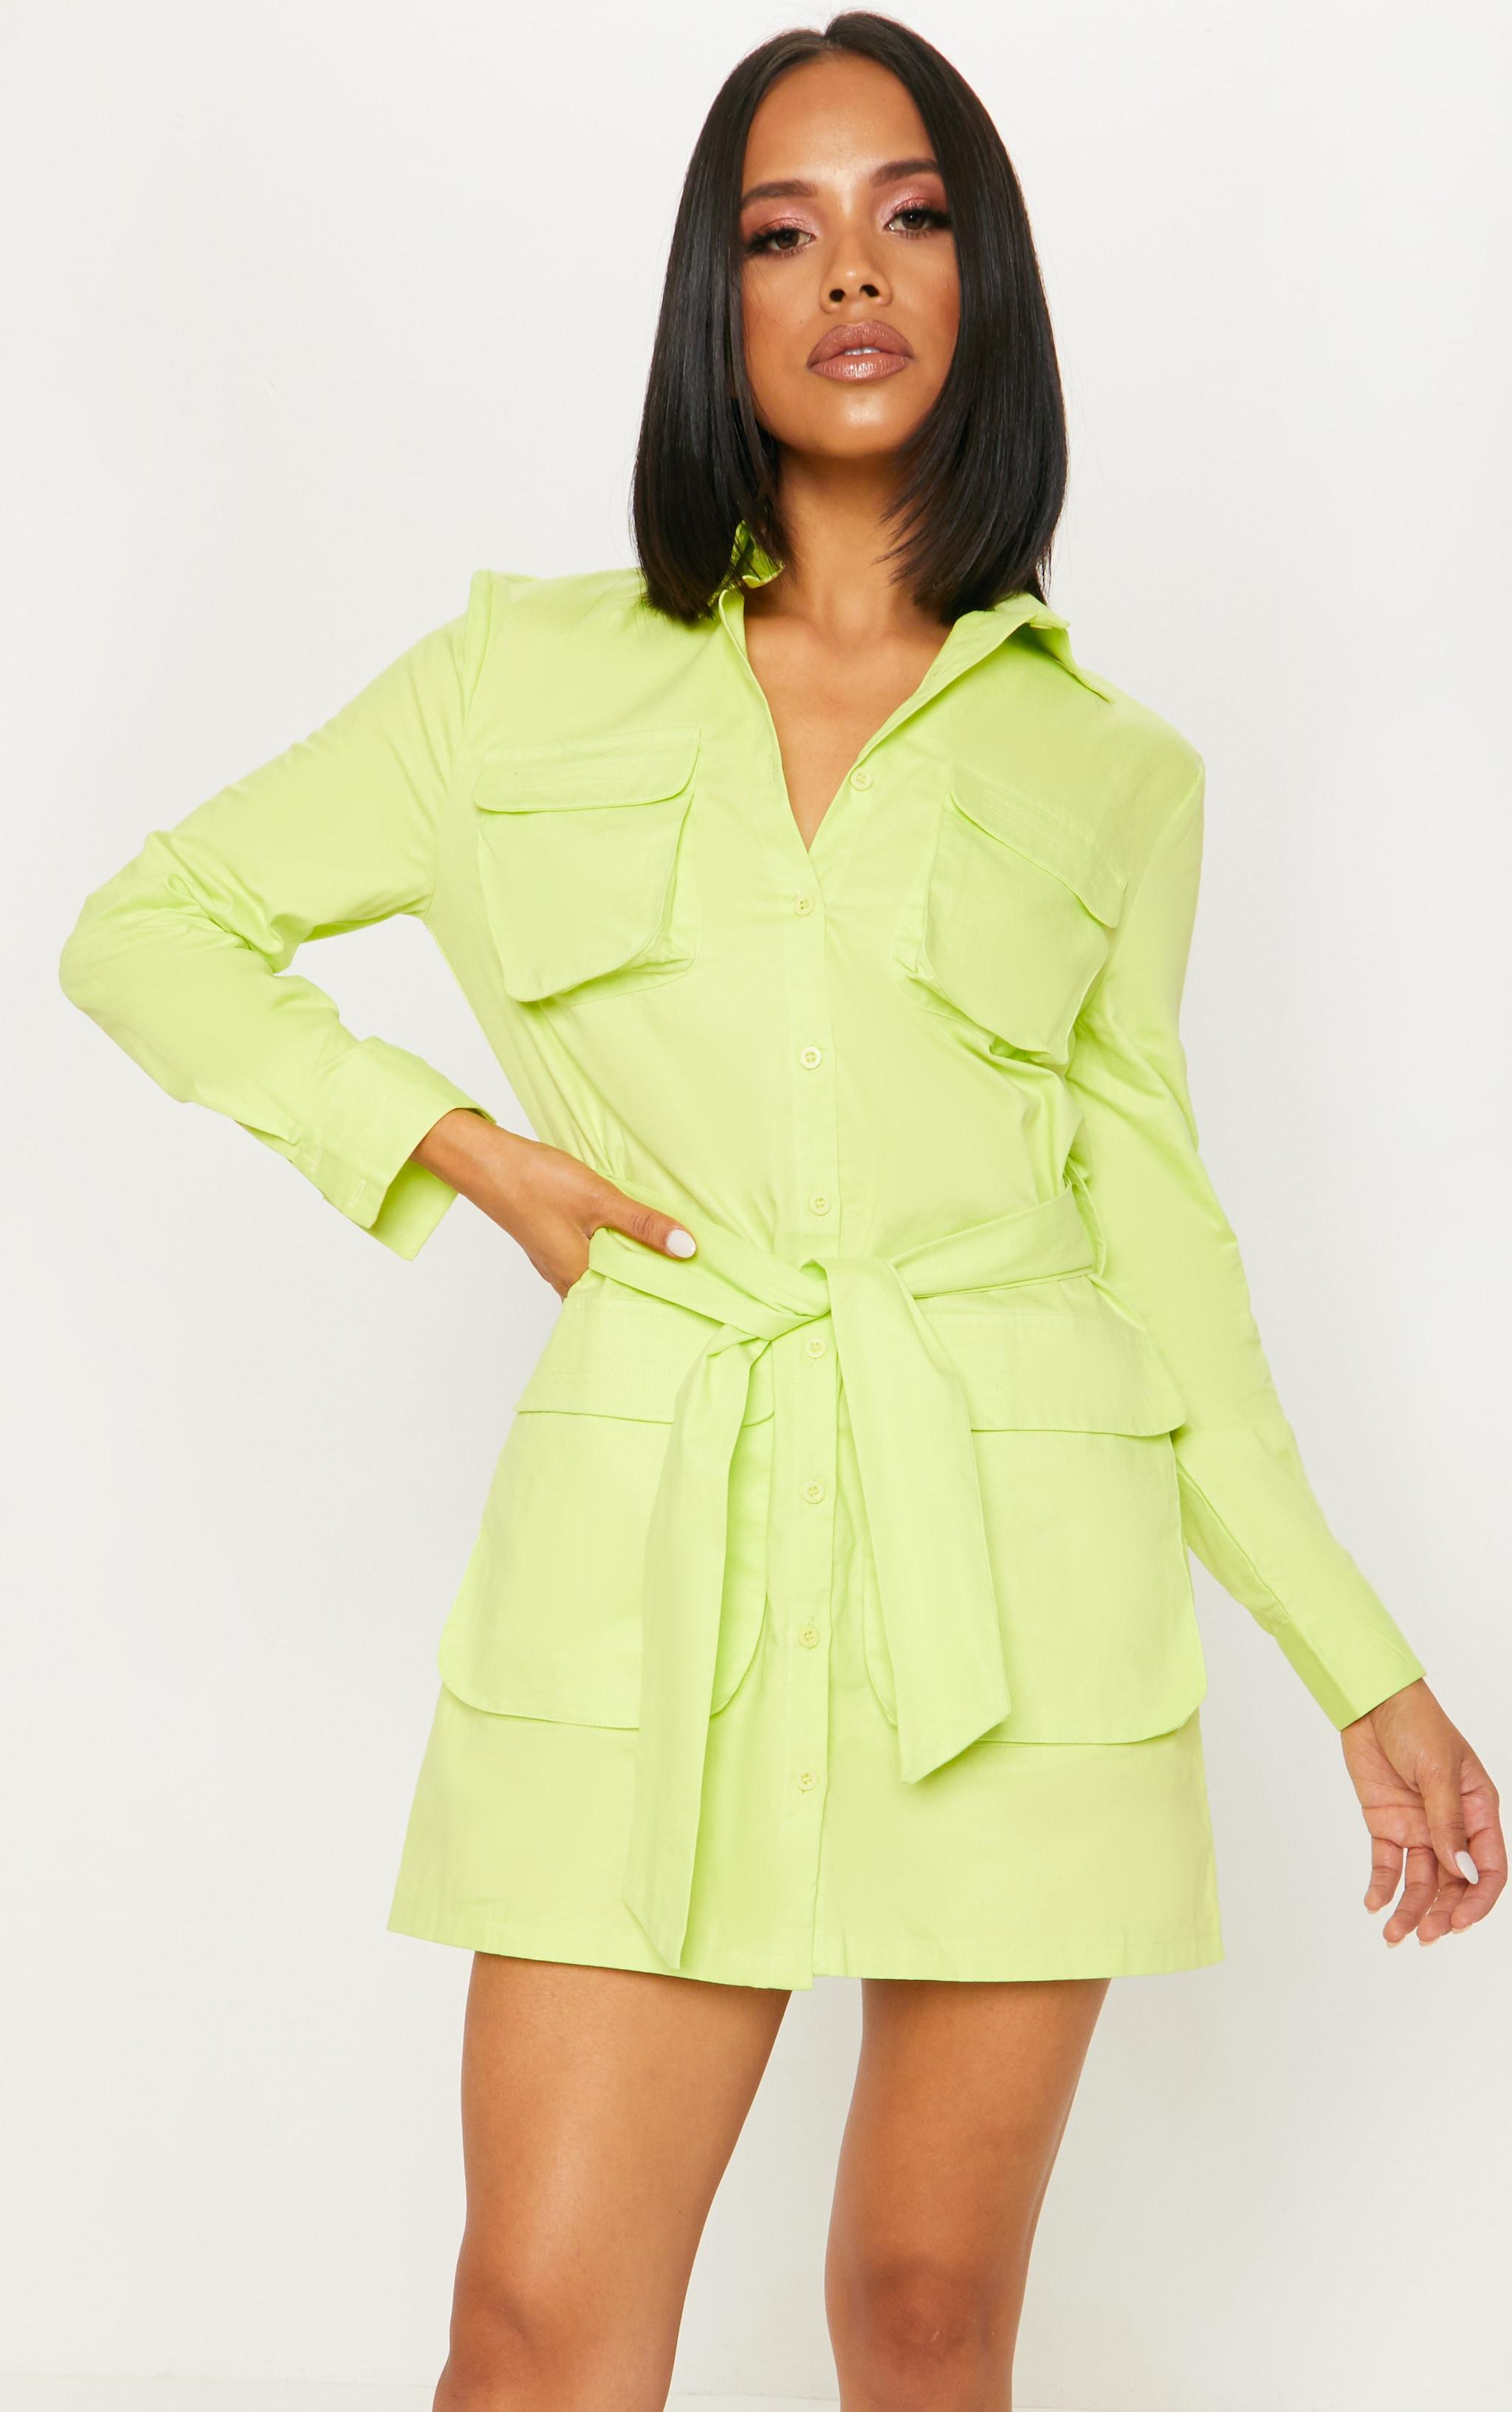 Chemise Style Nouée À Utilitaire Taille Citron La Robe Fluo Vert v76yIYbfg